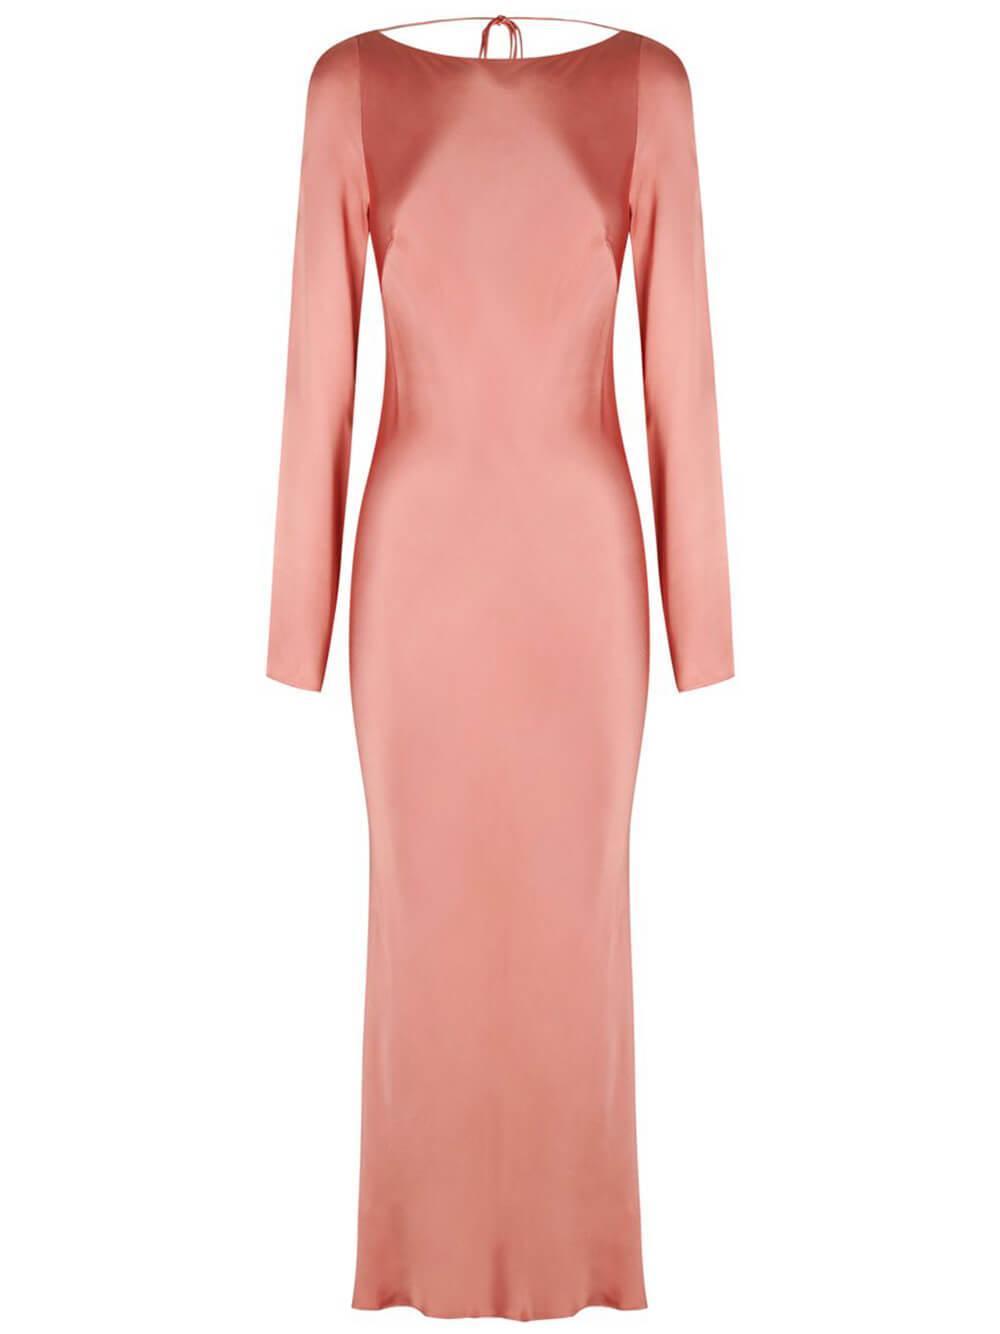 Eloise Backless Midi Dress Item # 213061